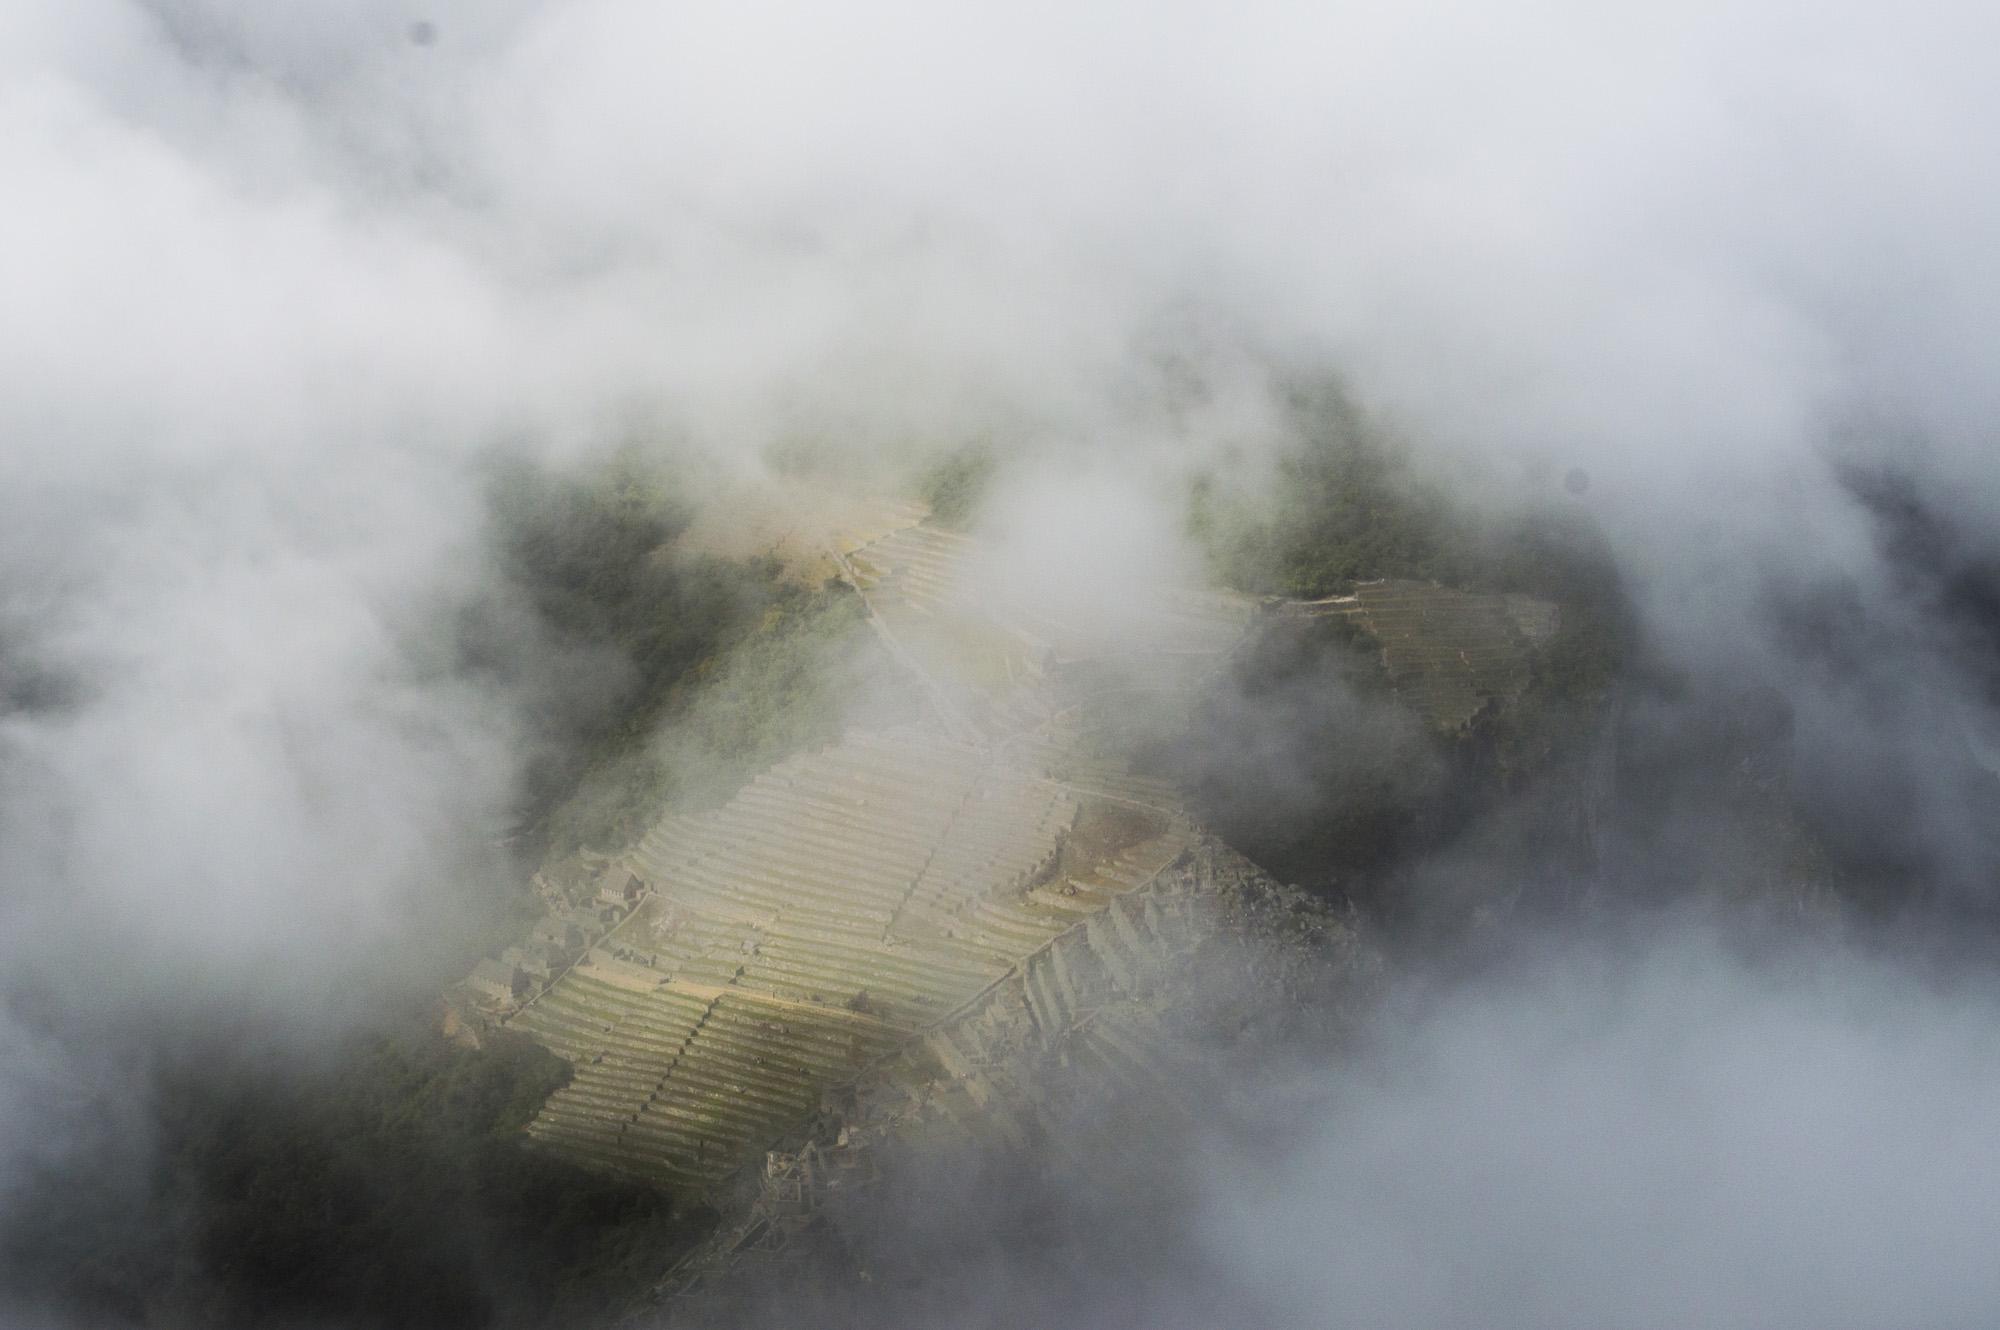 Inca 5 MP from WP in fog.jpg